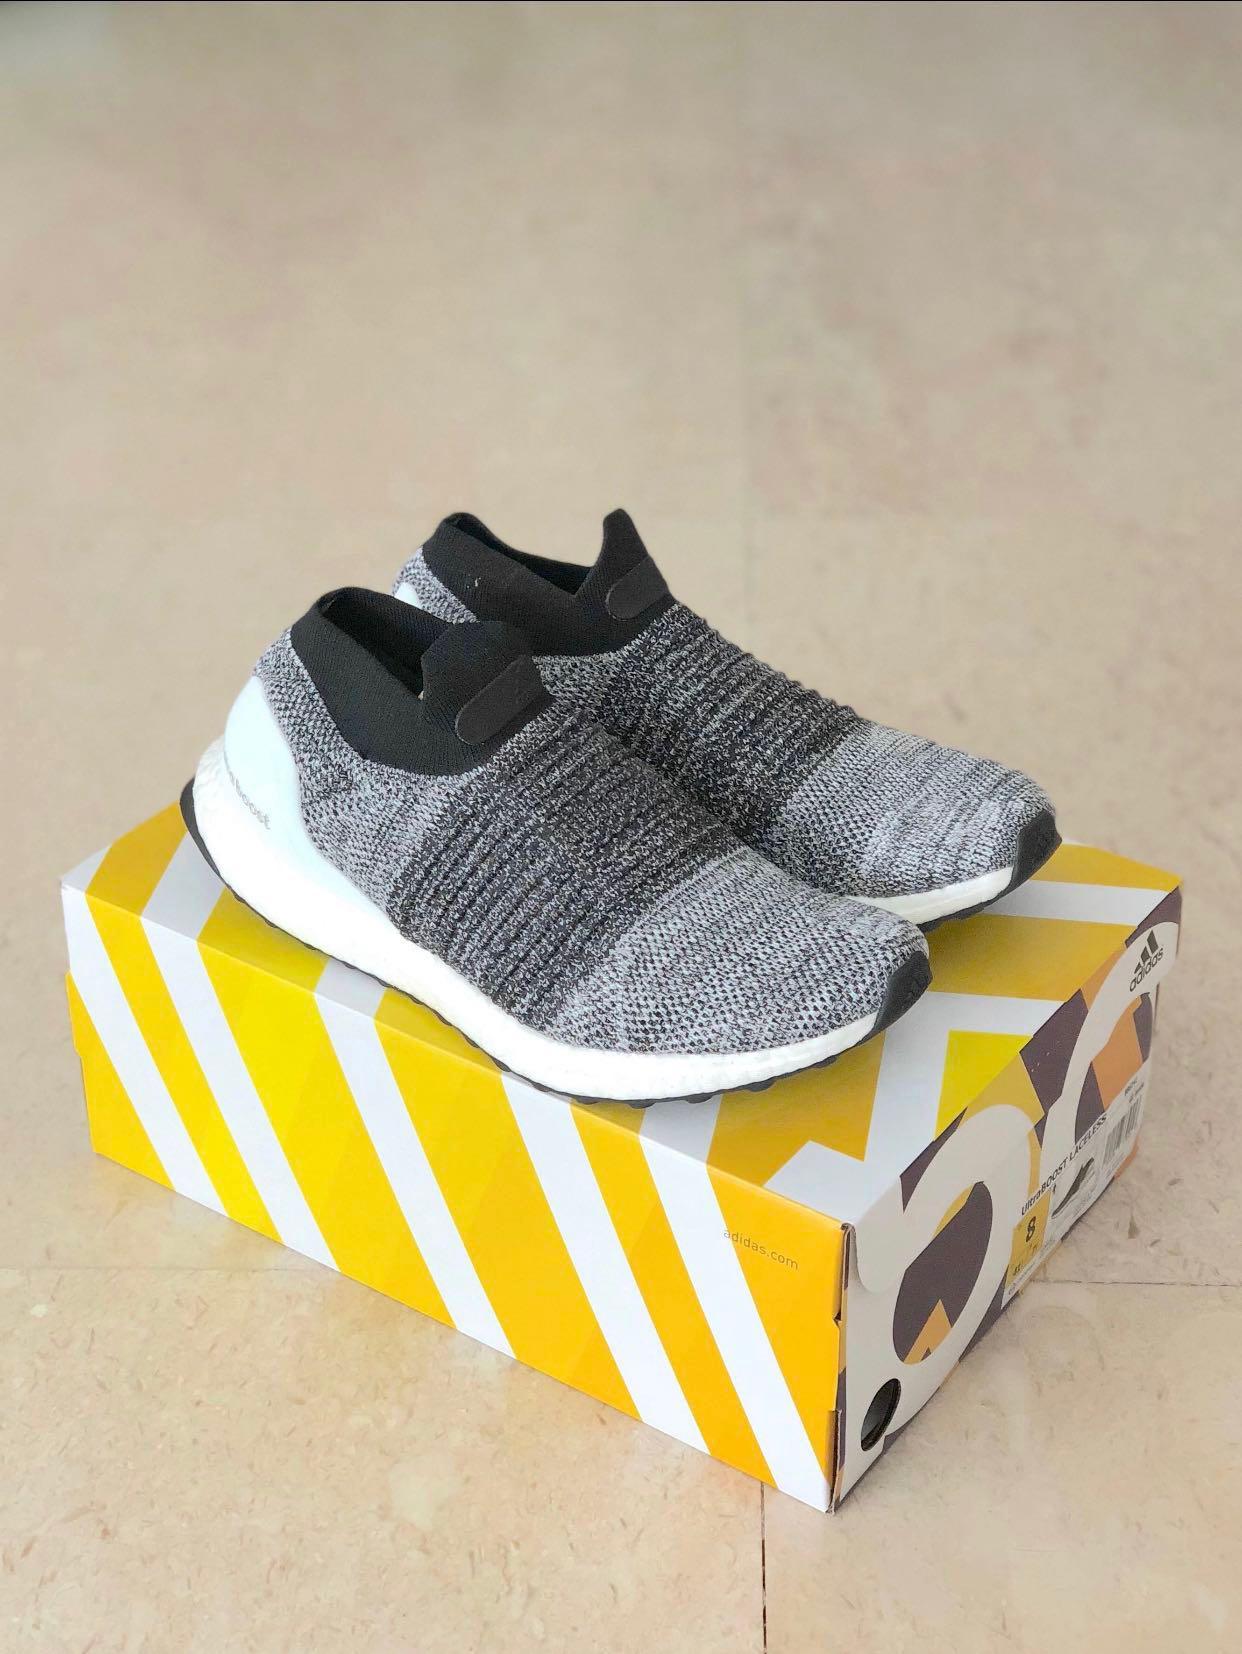 589d1ab9030f5 UK7.5 Adidas Ultraboost Laceless Oreo